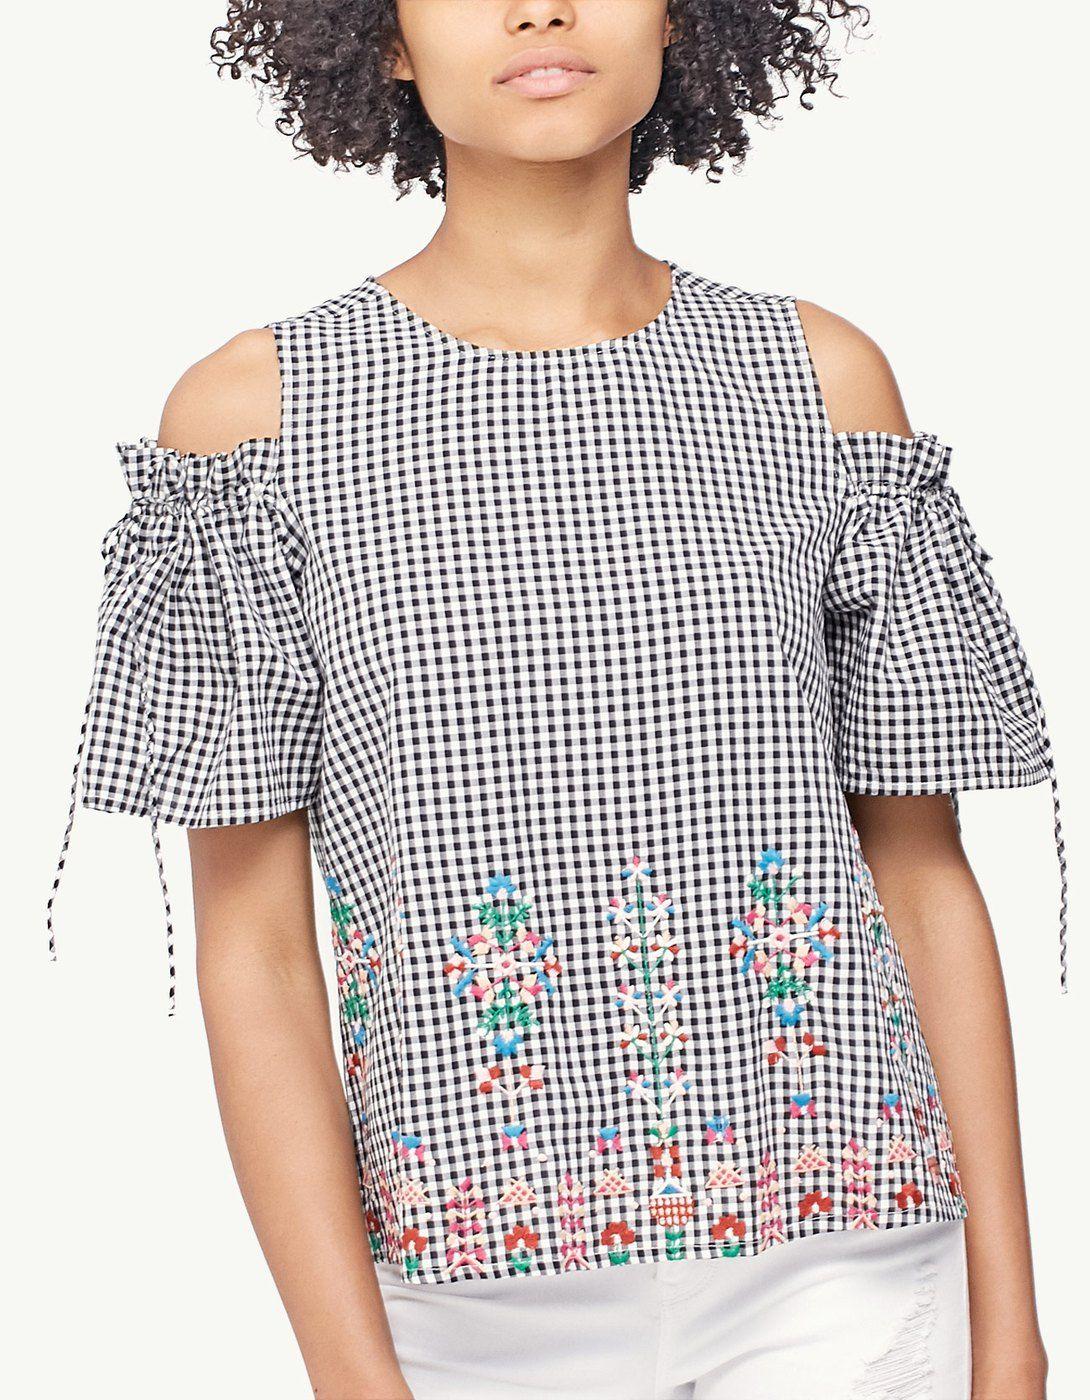 Top agujero hombro bordado | traje de baño unicos | Pinterest ...